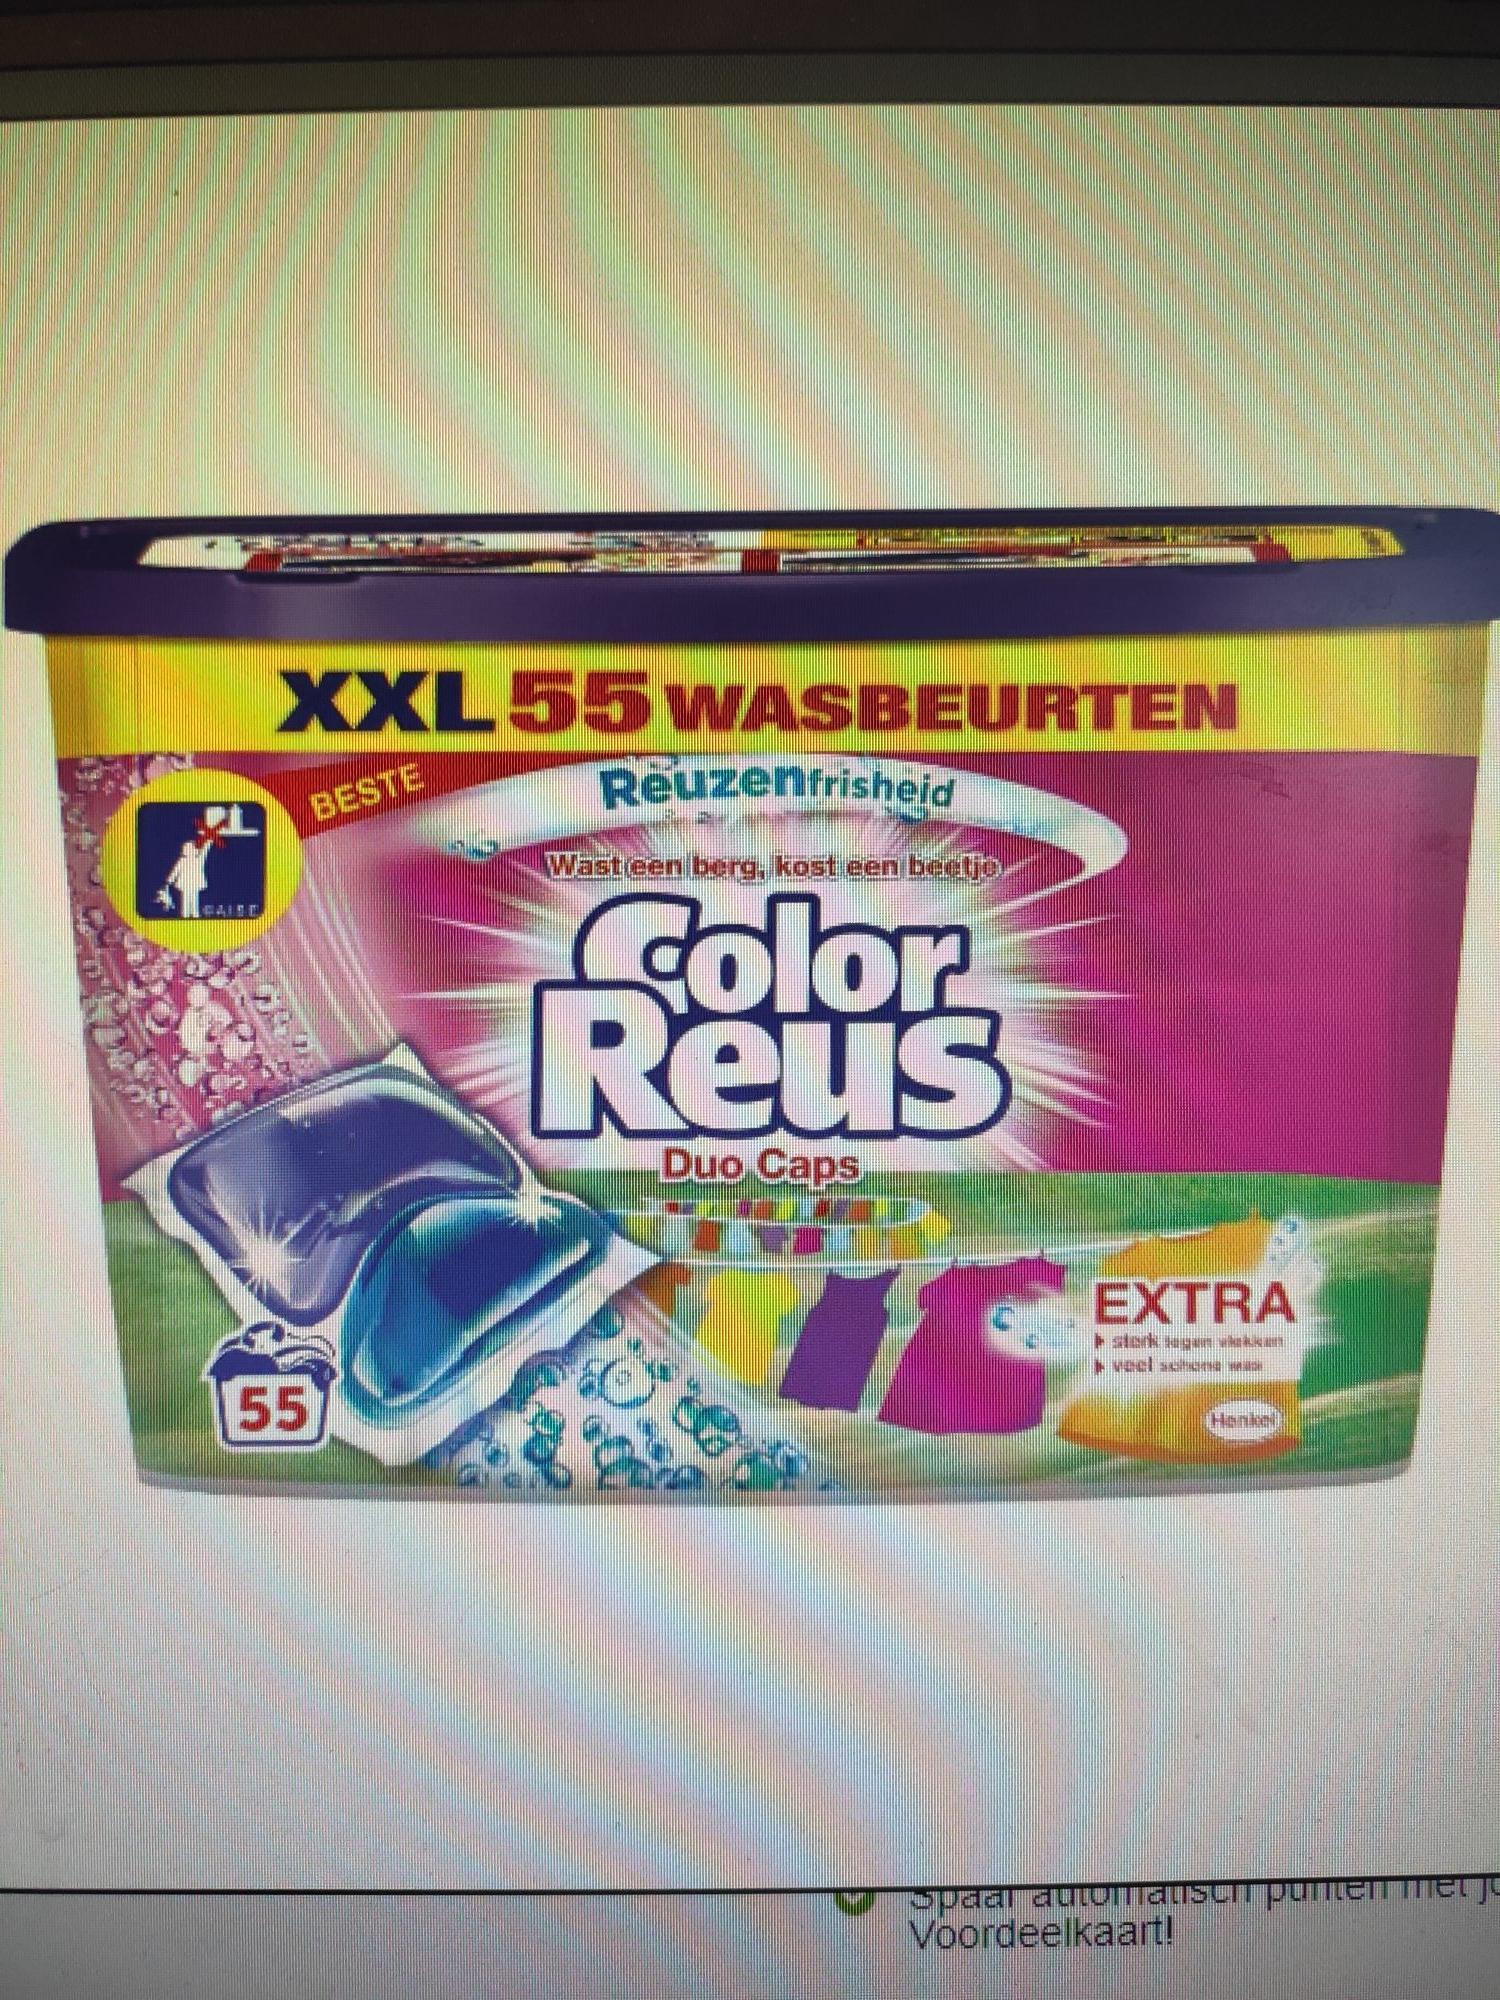 Color reus duo caps, 11 cent per cap